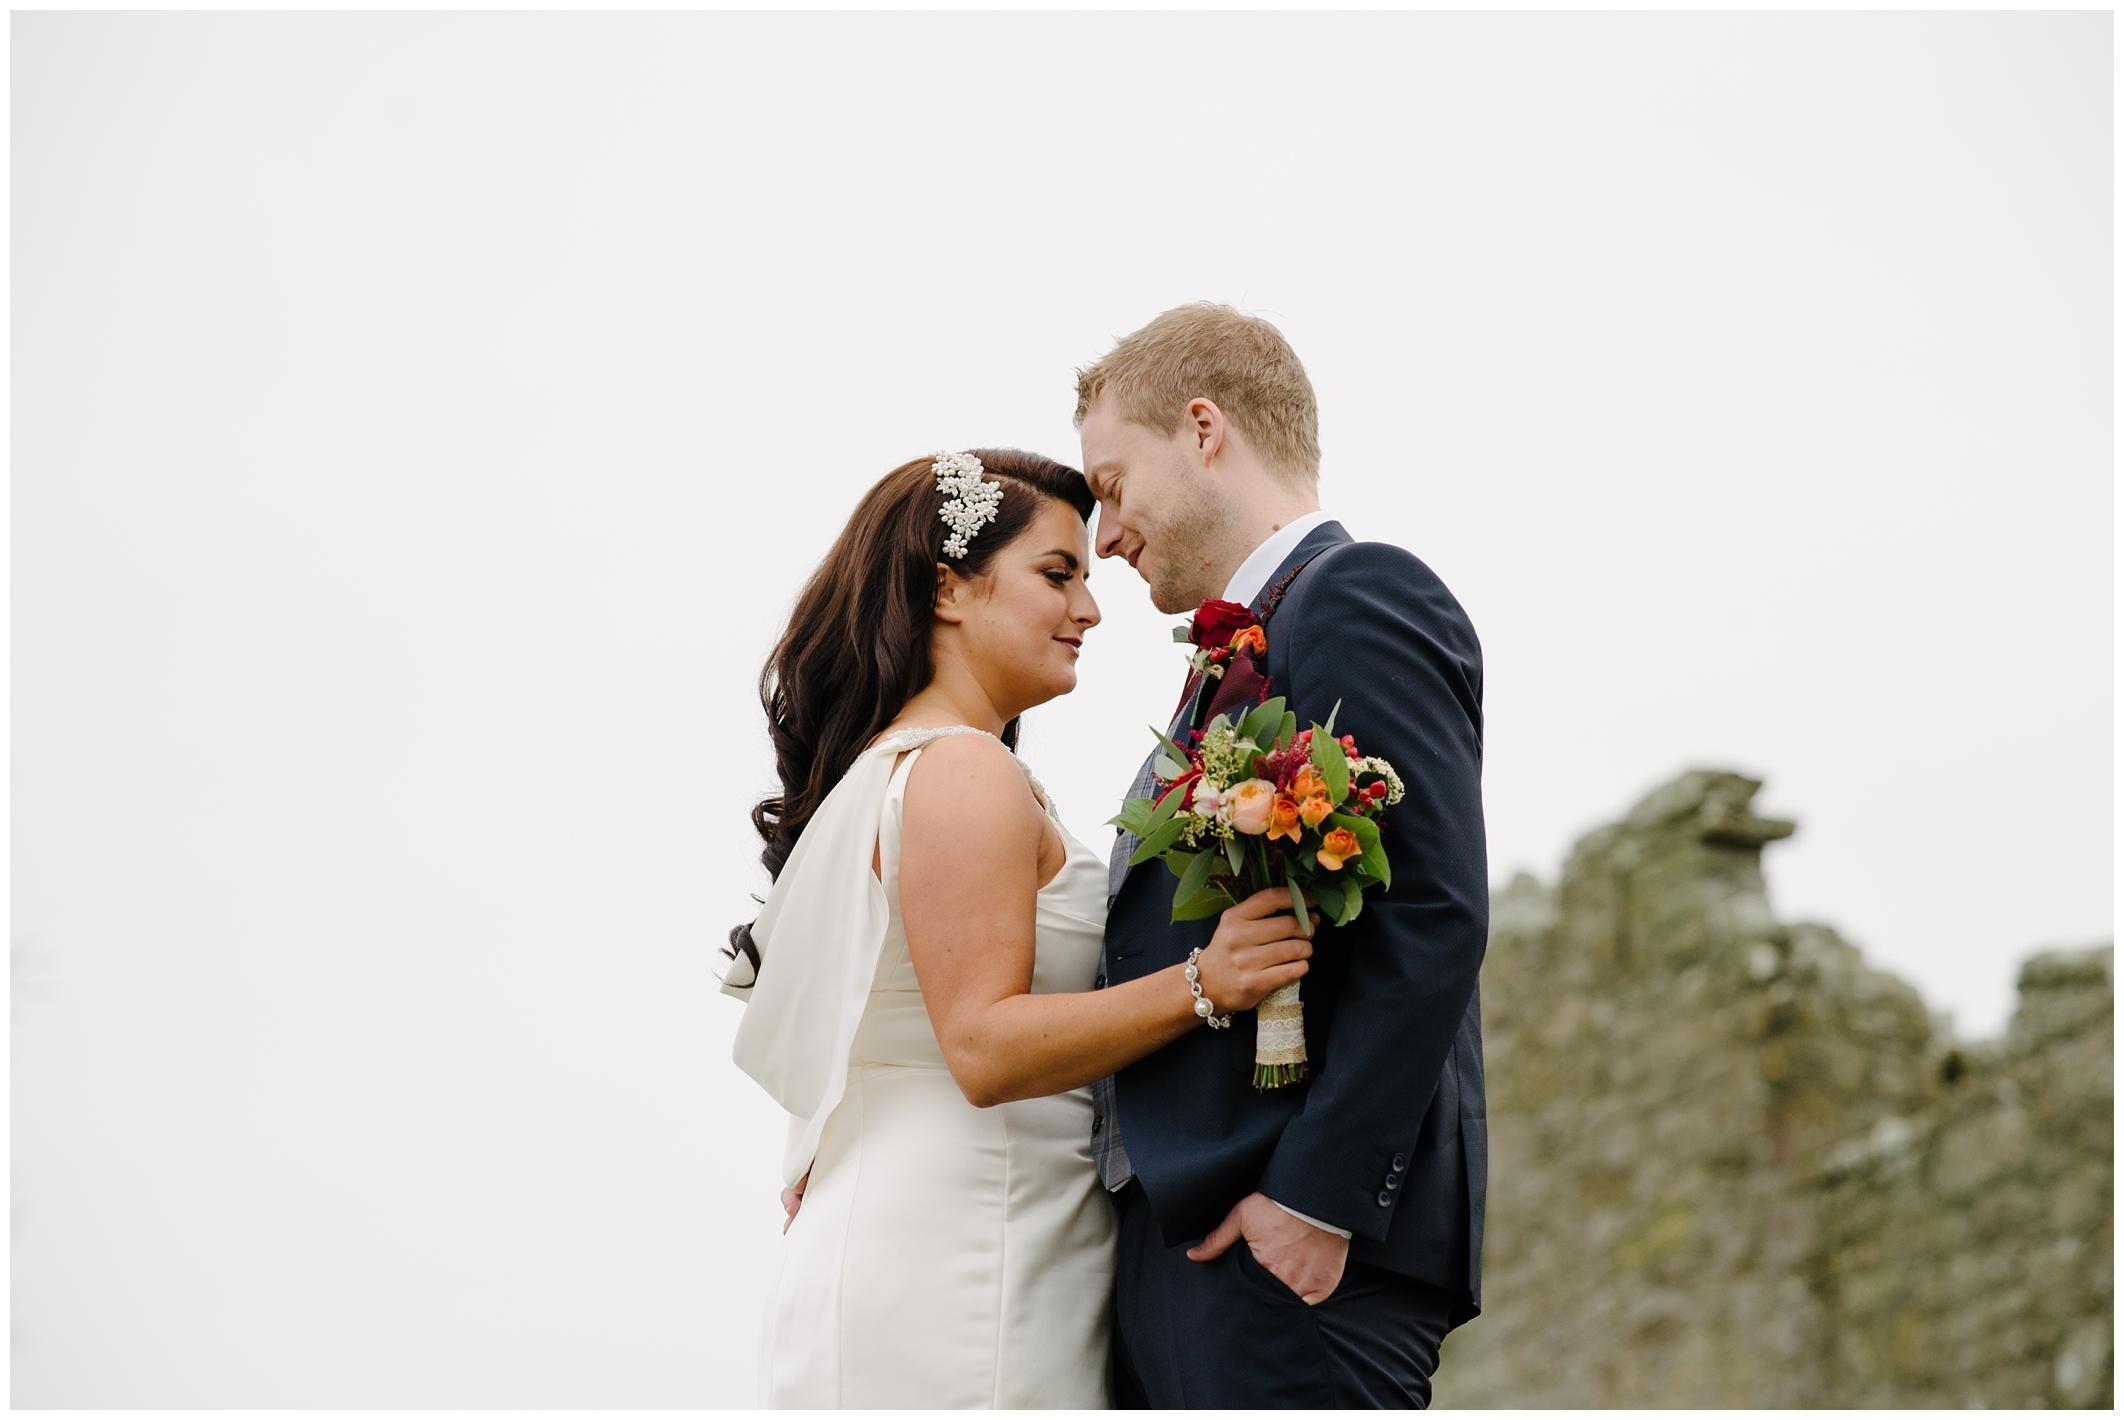 tracey_conor__wedding_jude_browne_photography_0040.jpg